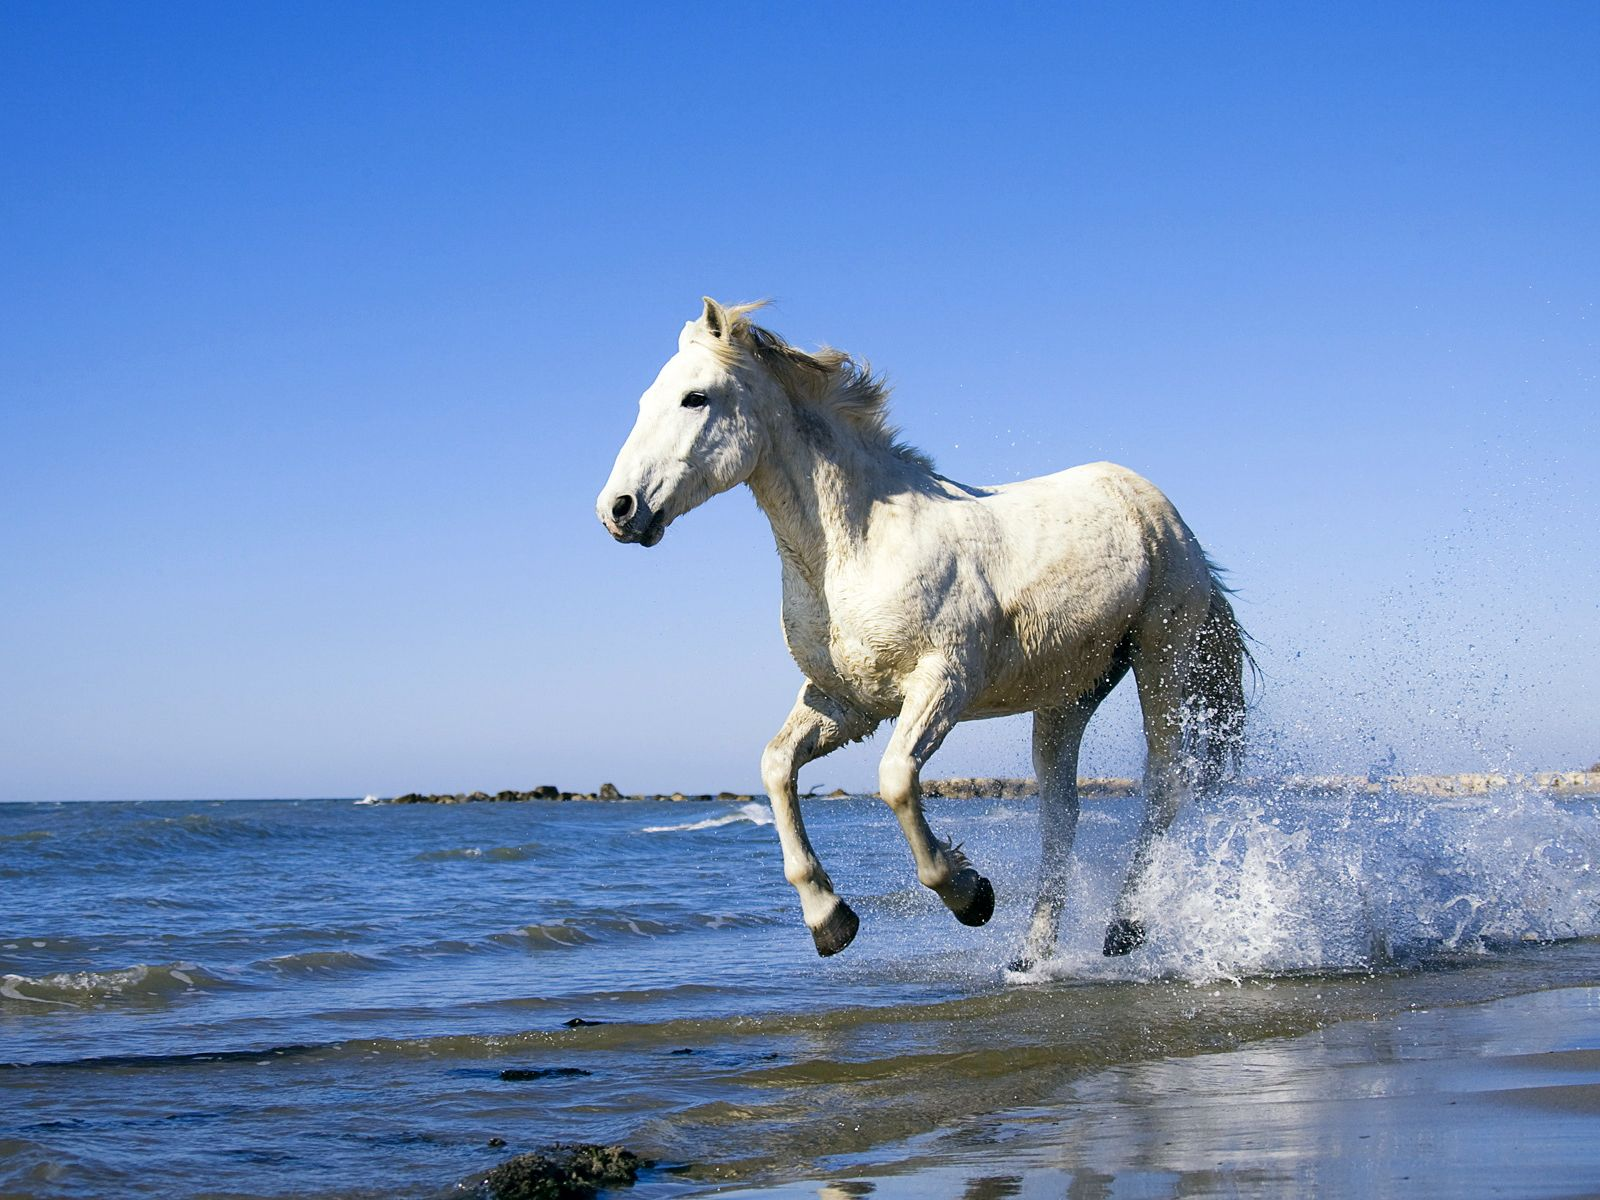 white horse wallpaper high resolution